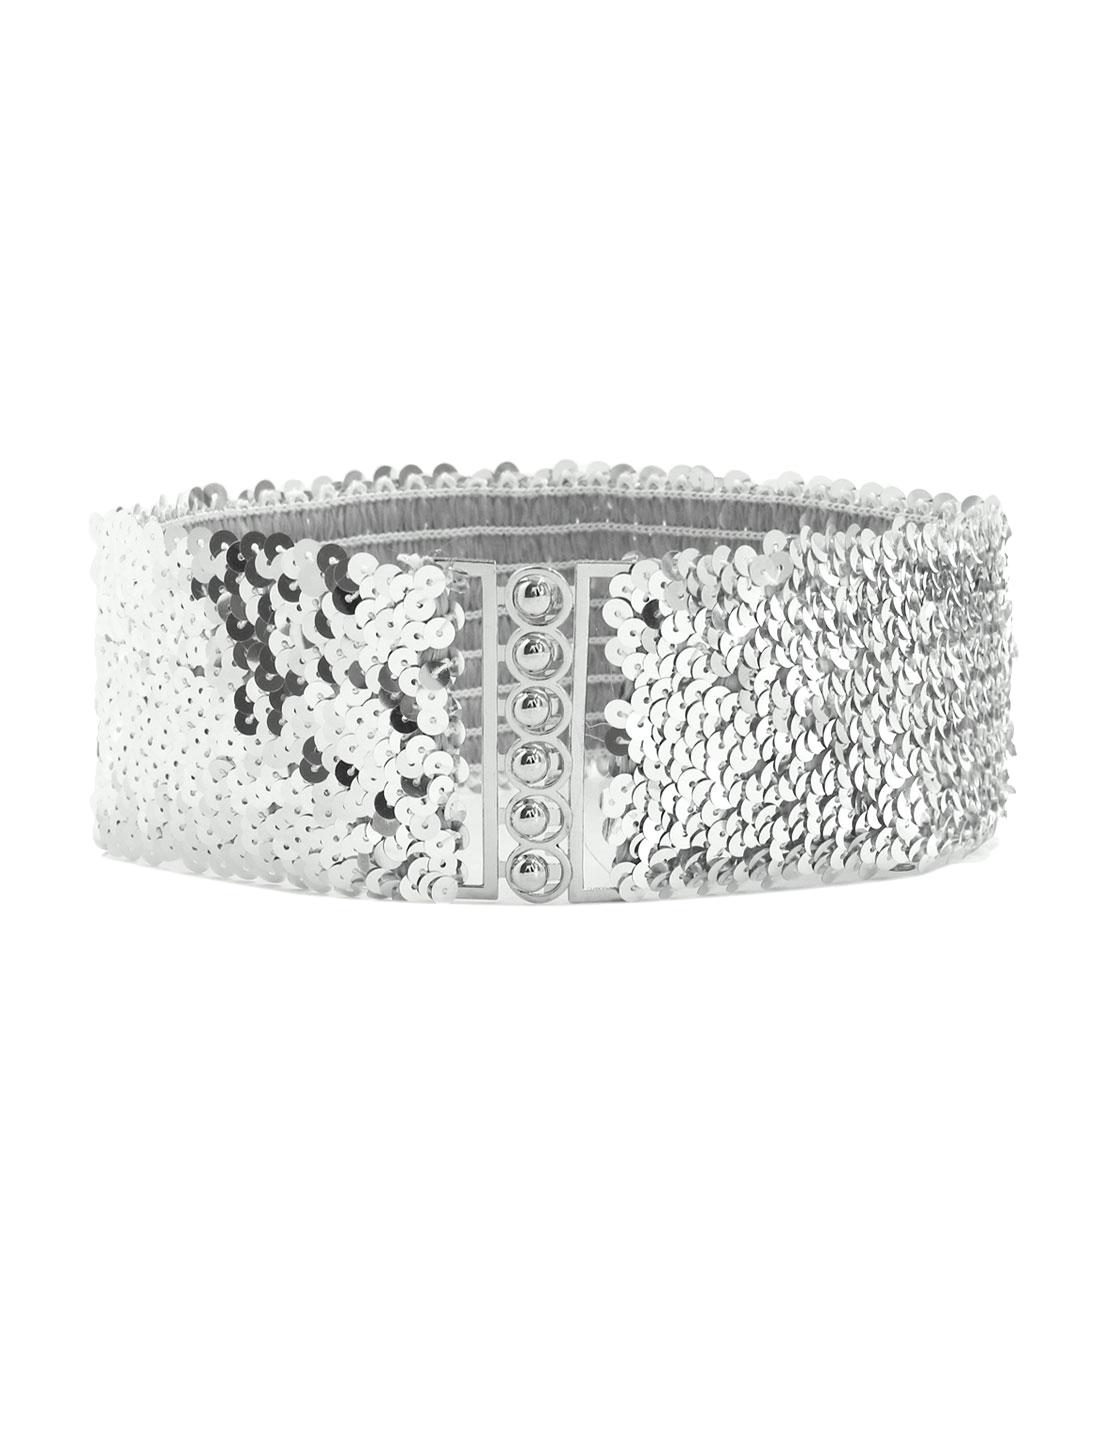 Lady Sequins Decor Metal Interlooking Buckles Elastic Waist Belt Silver